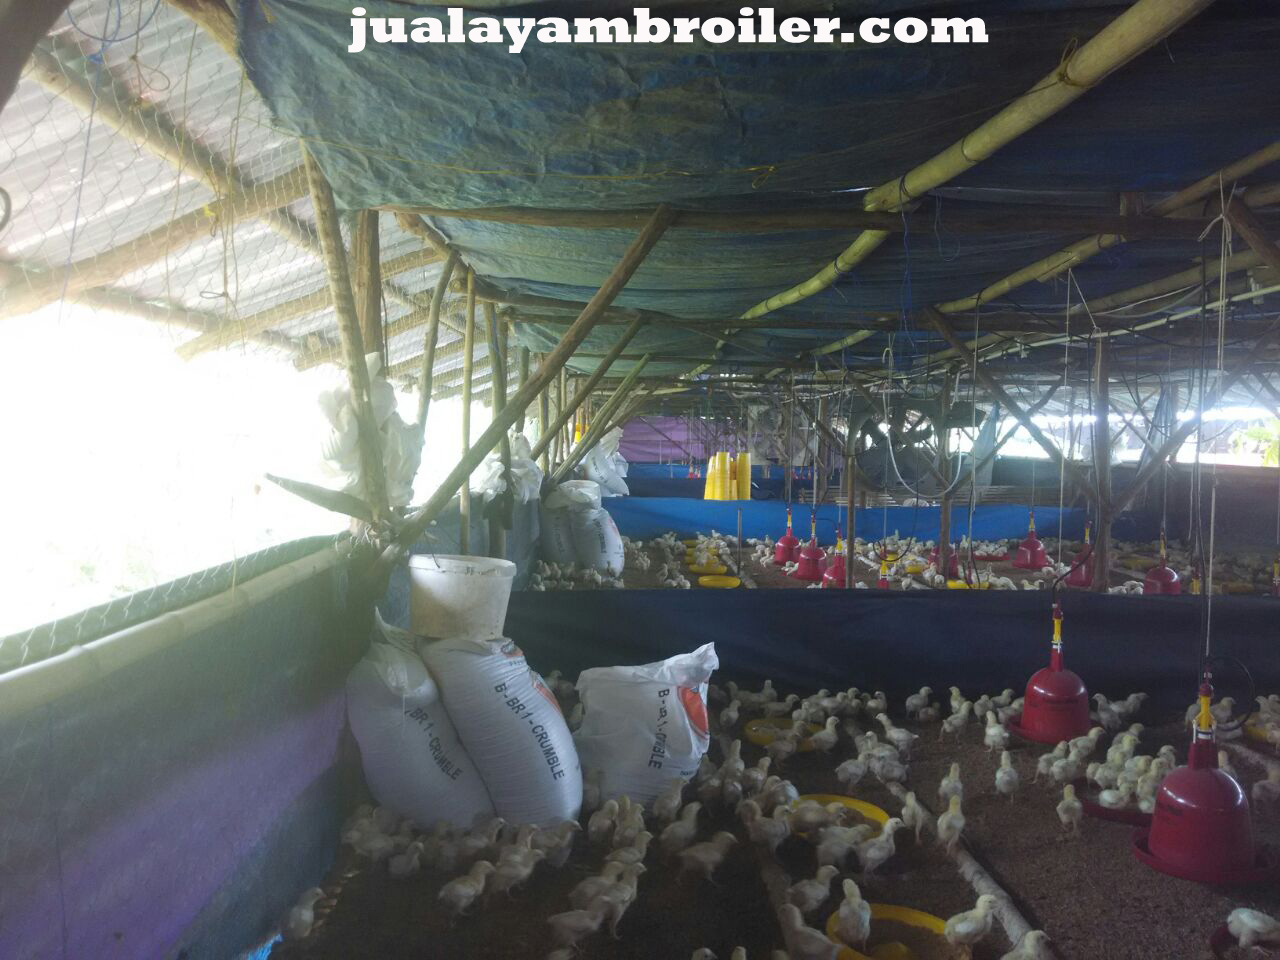 Jual Ayam Broiler Kebon Manggis Jakarta Timur